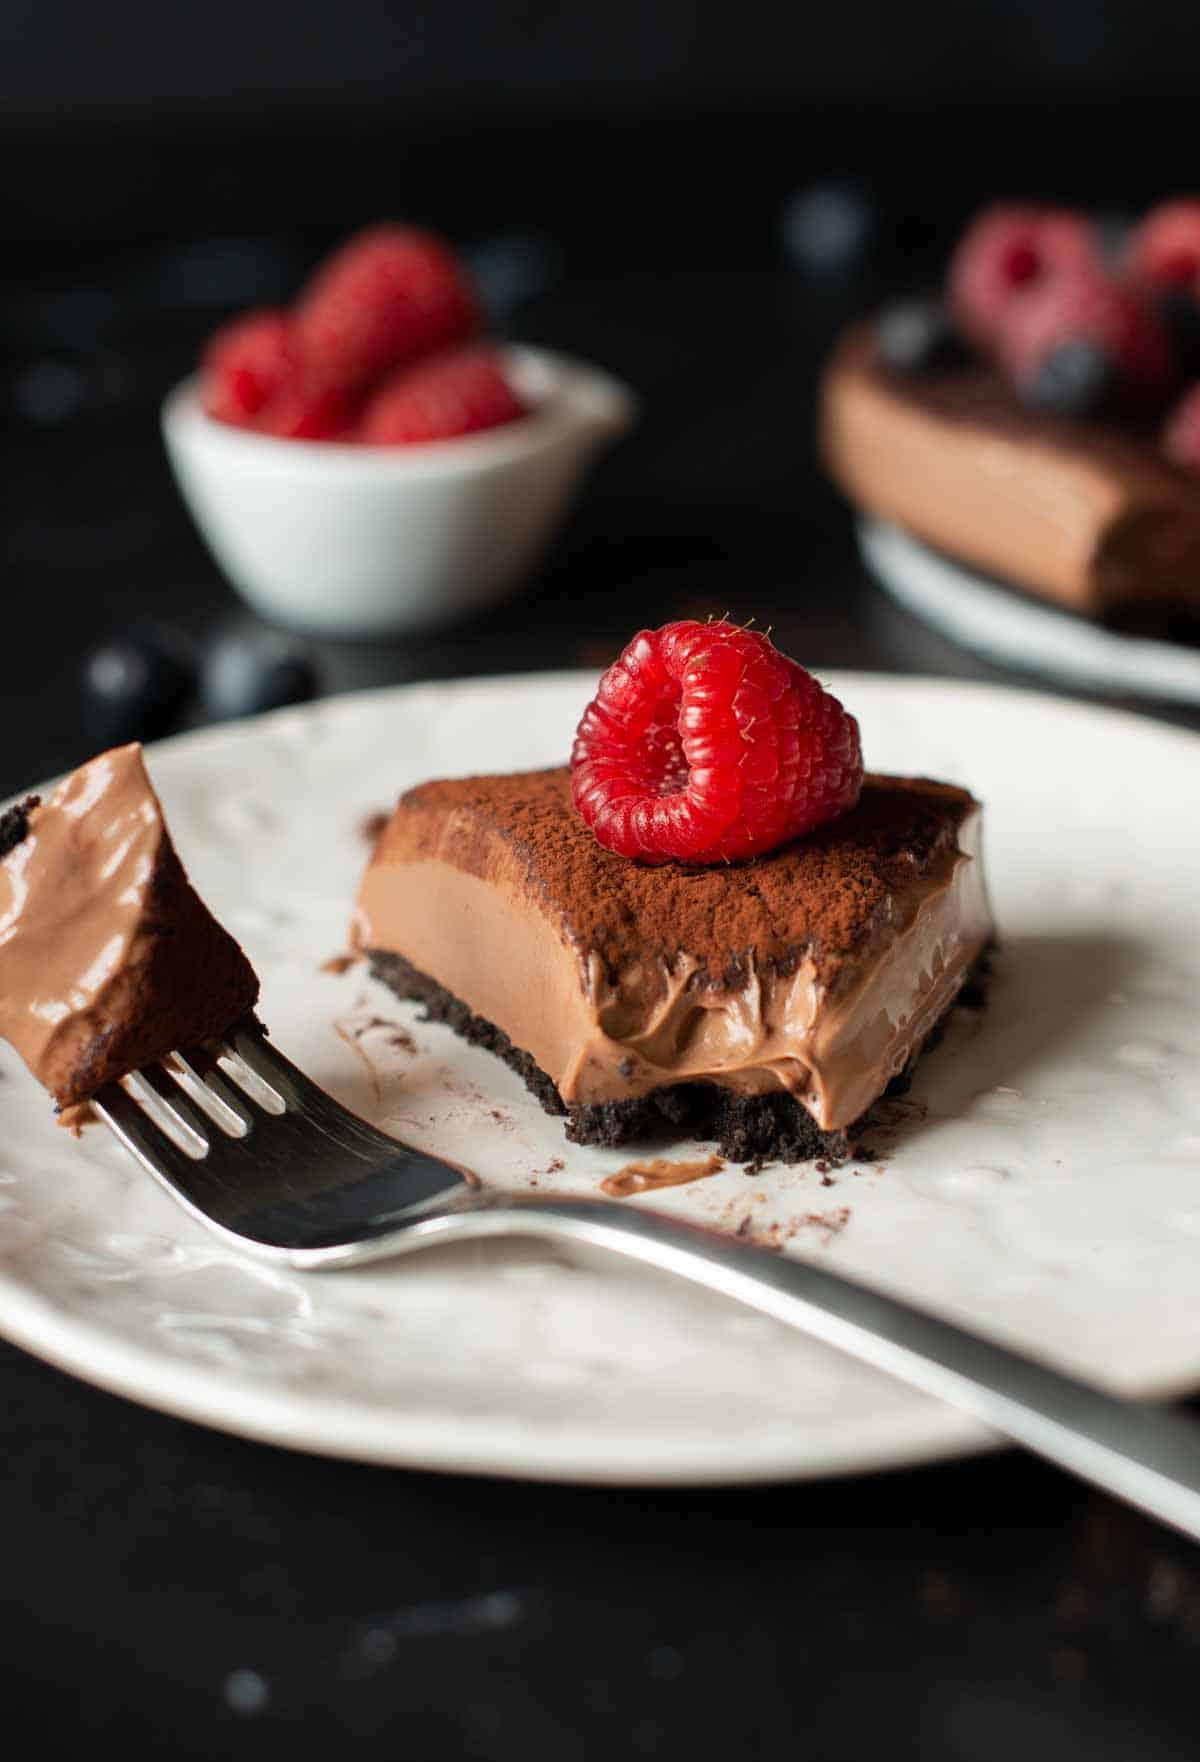 Imagine of a piece of no bake chocolate cheesecake